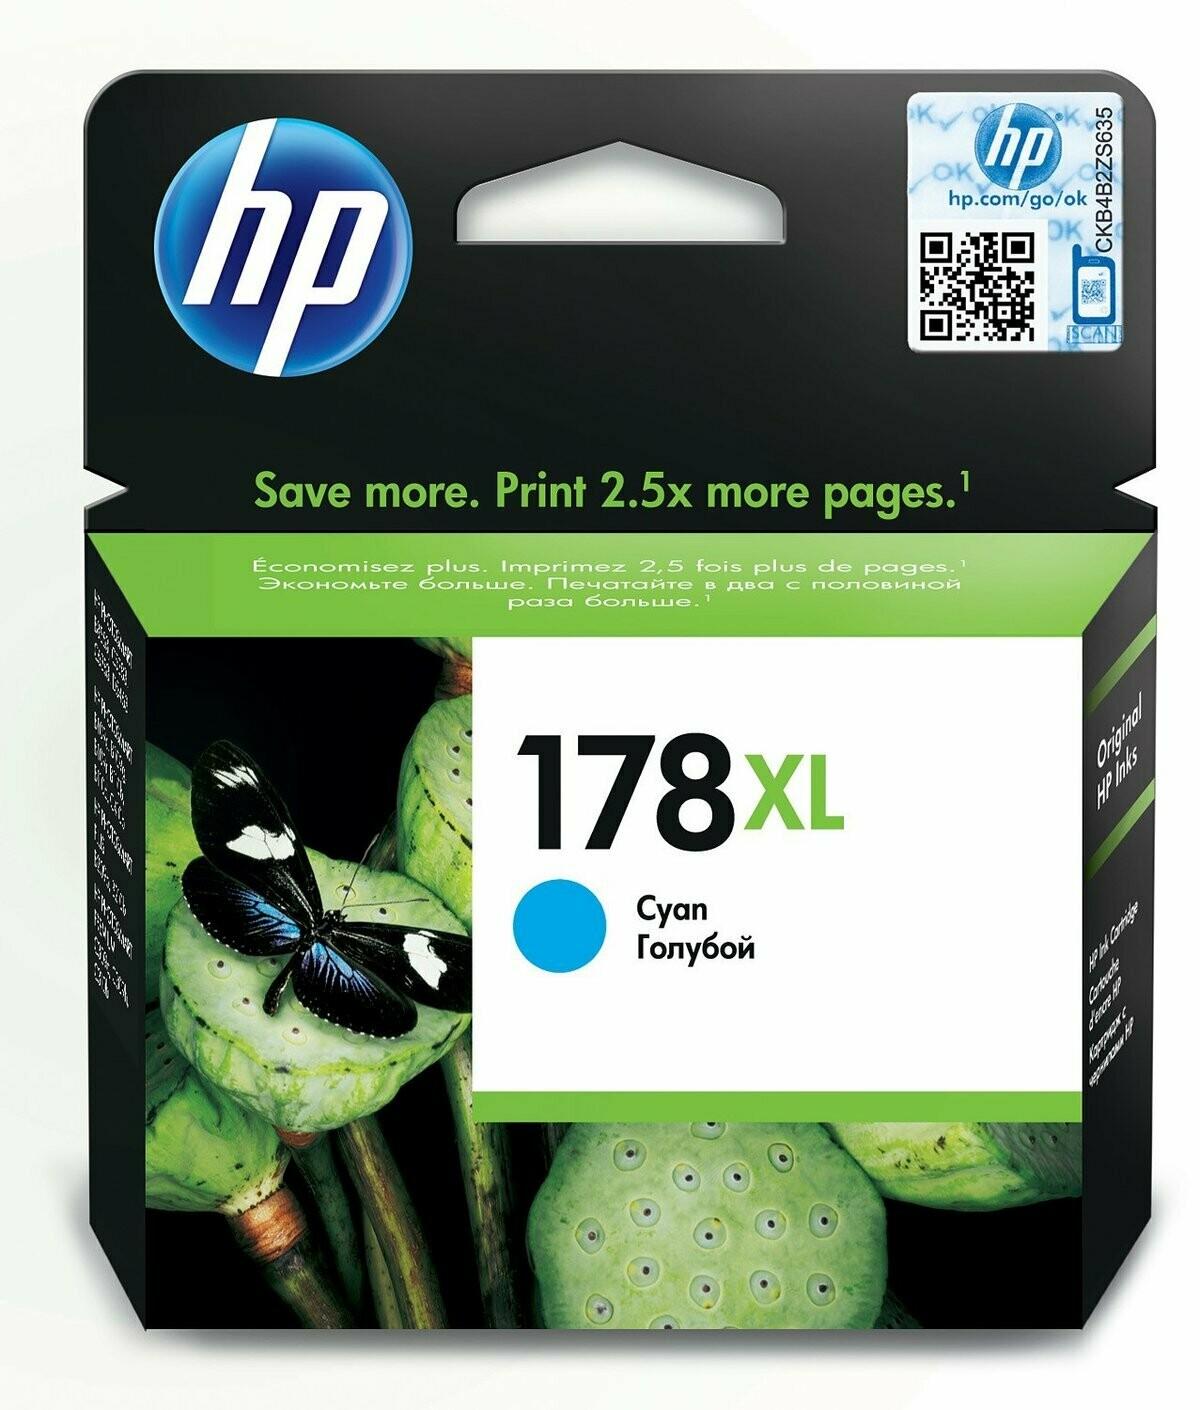 HP 178XL High Yield Cyan Original Ink Cartridge (CB323HE)